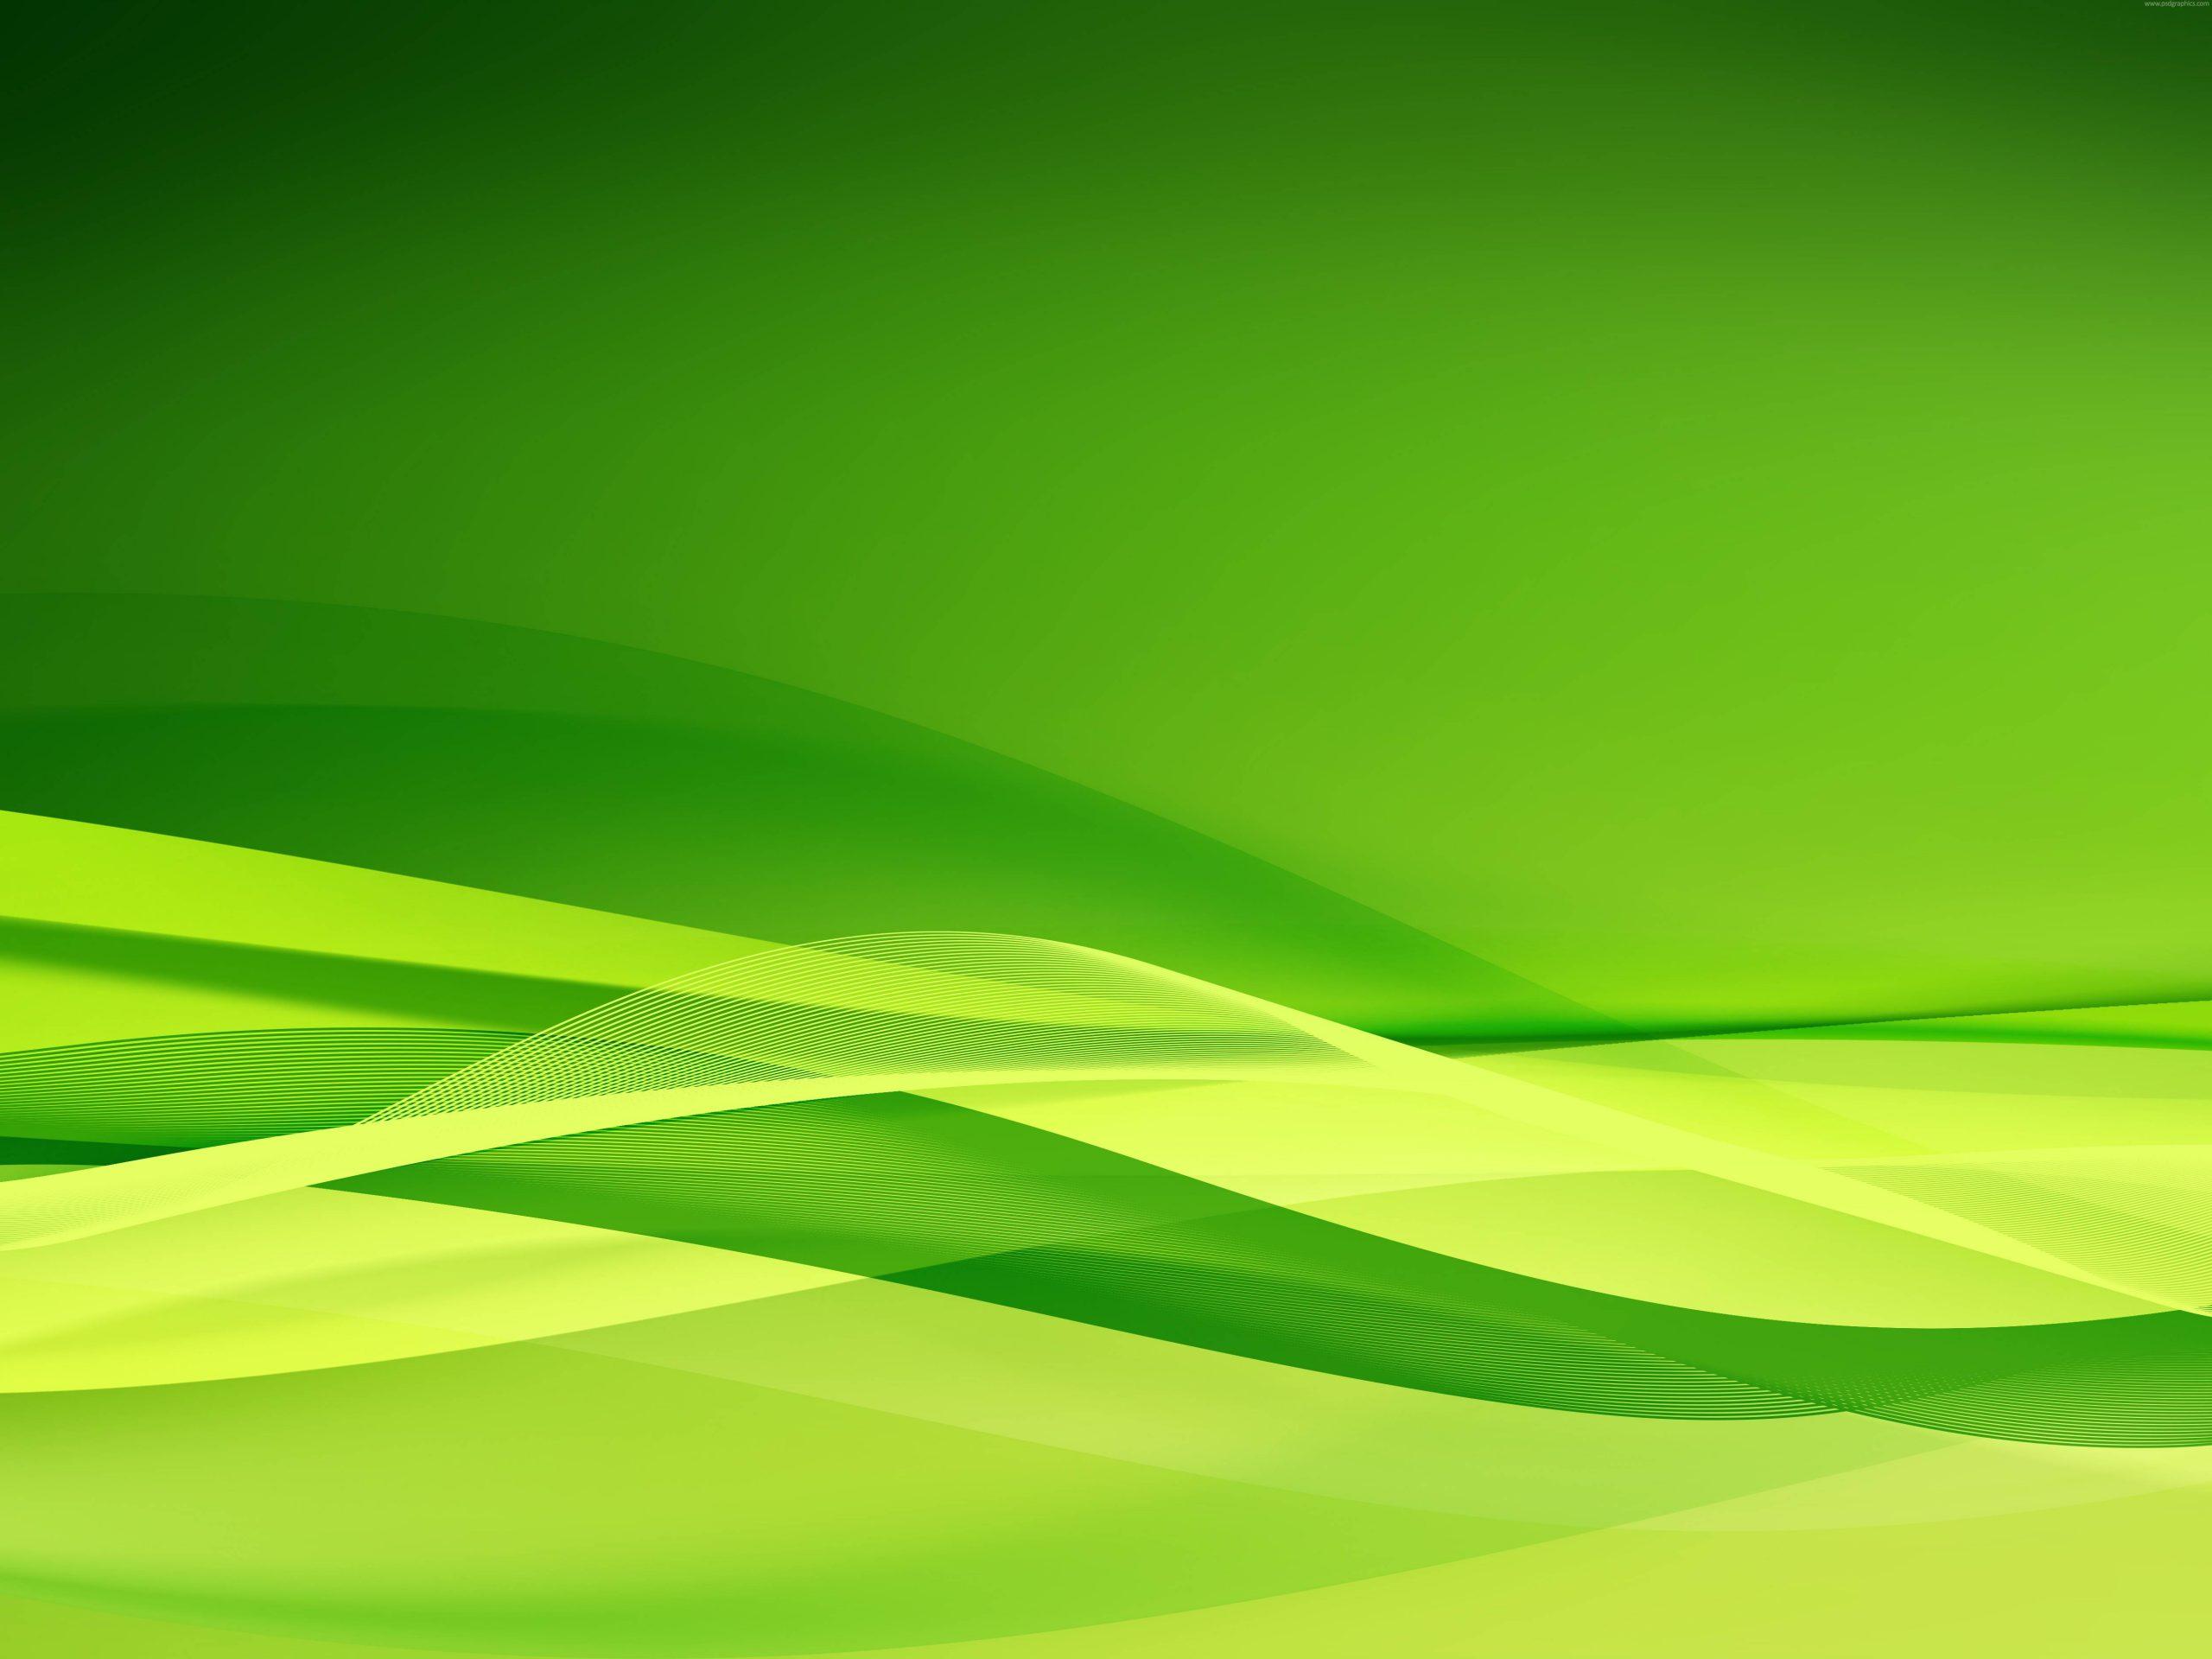 green wallpapers hd 4k (38)